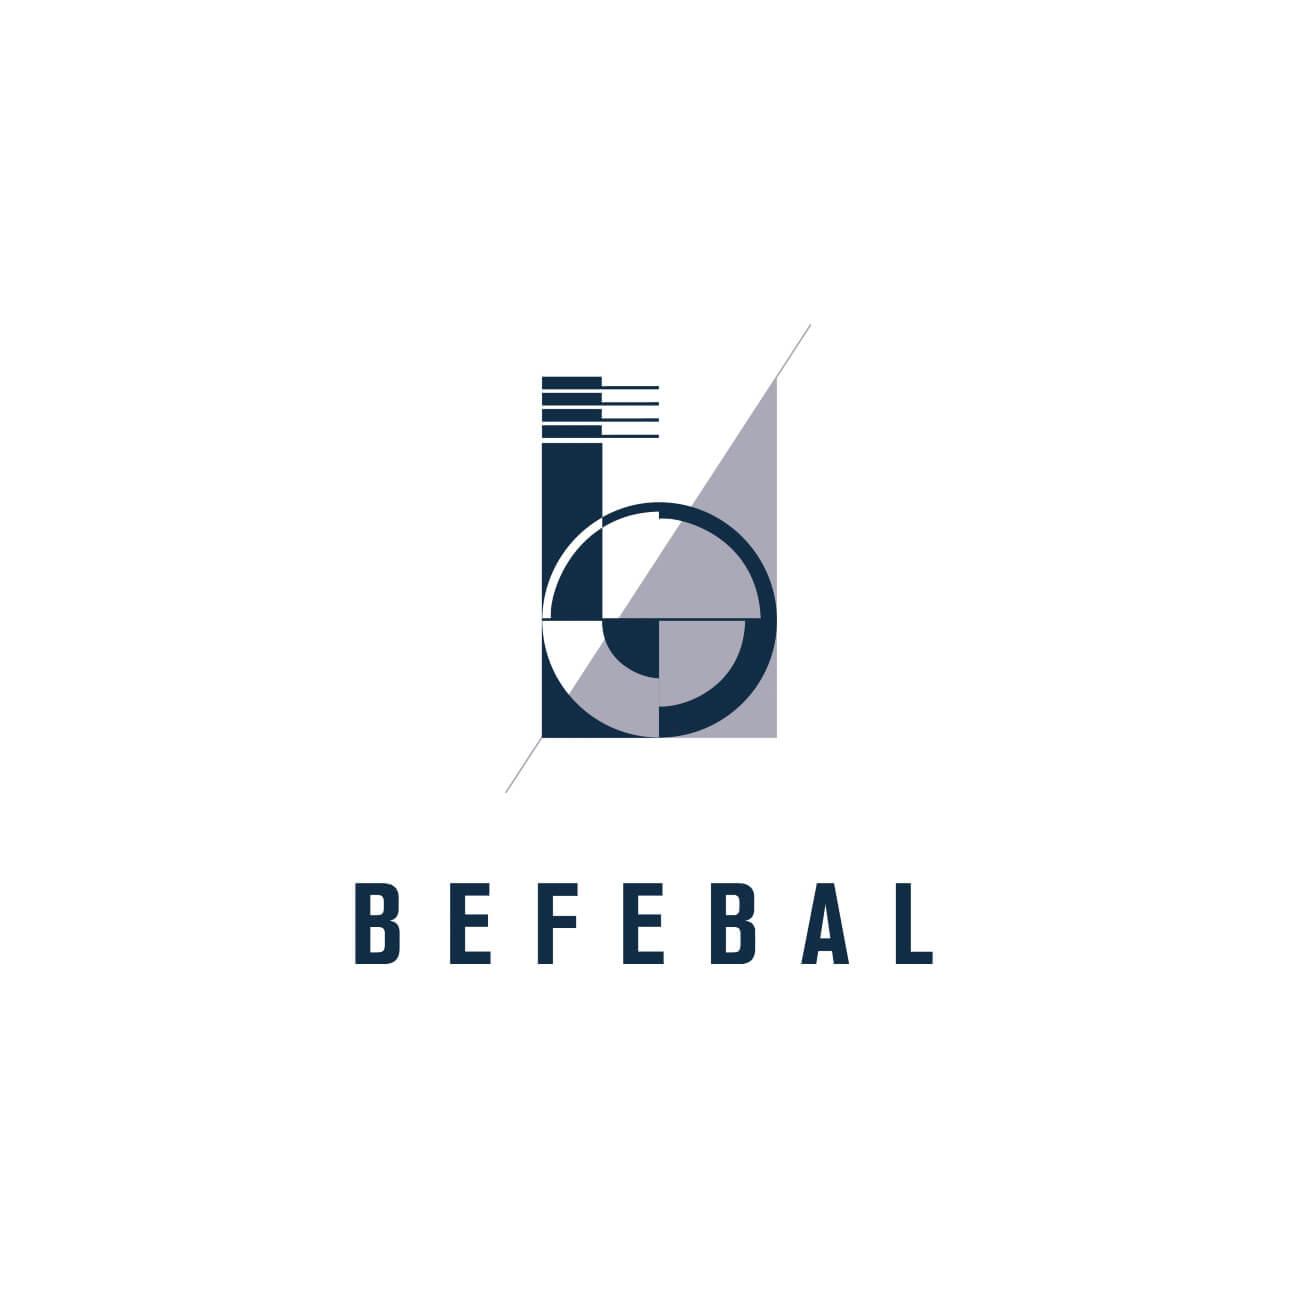 Befebal